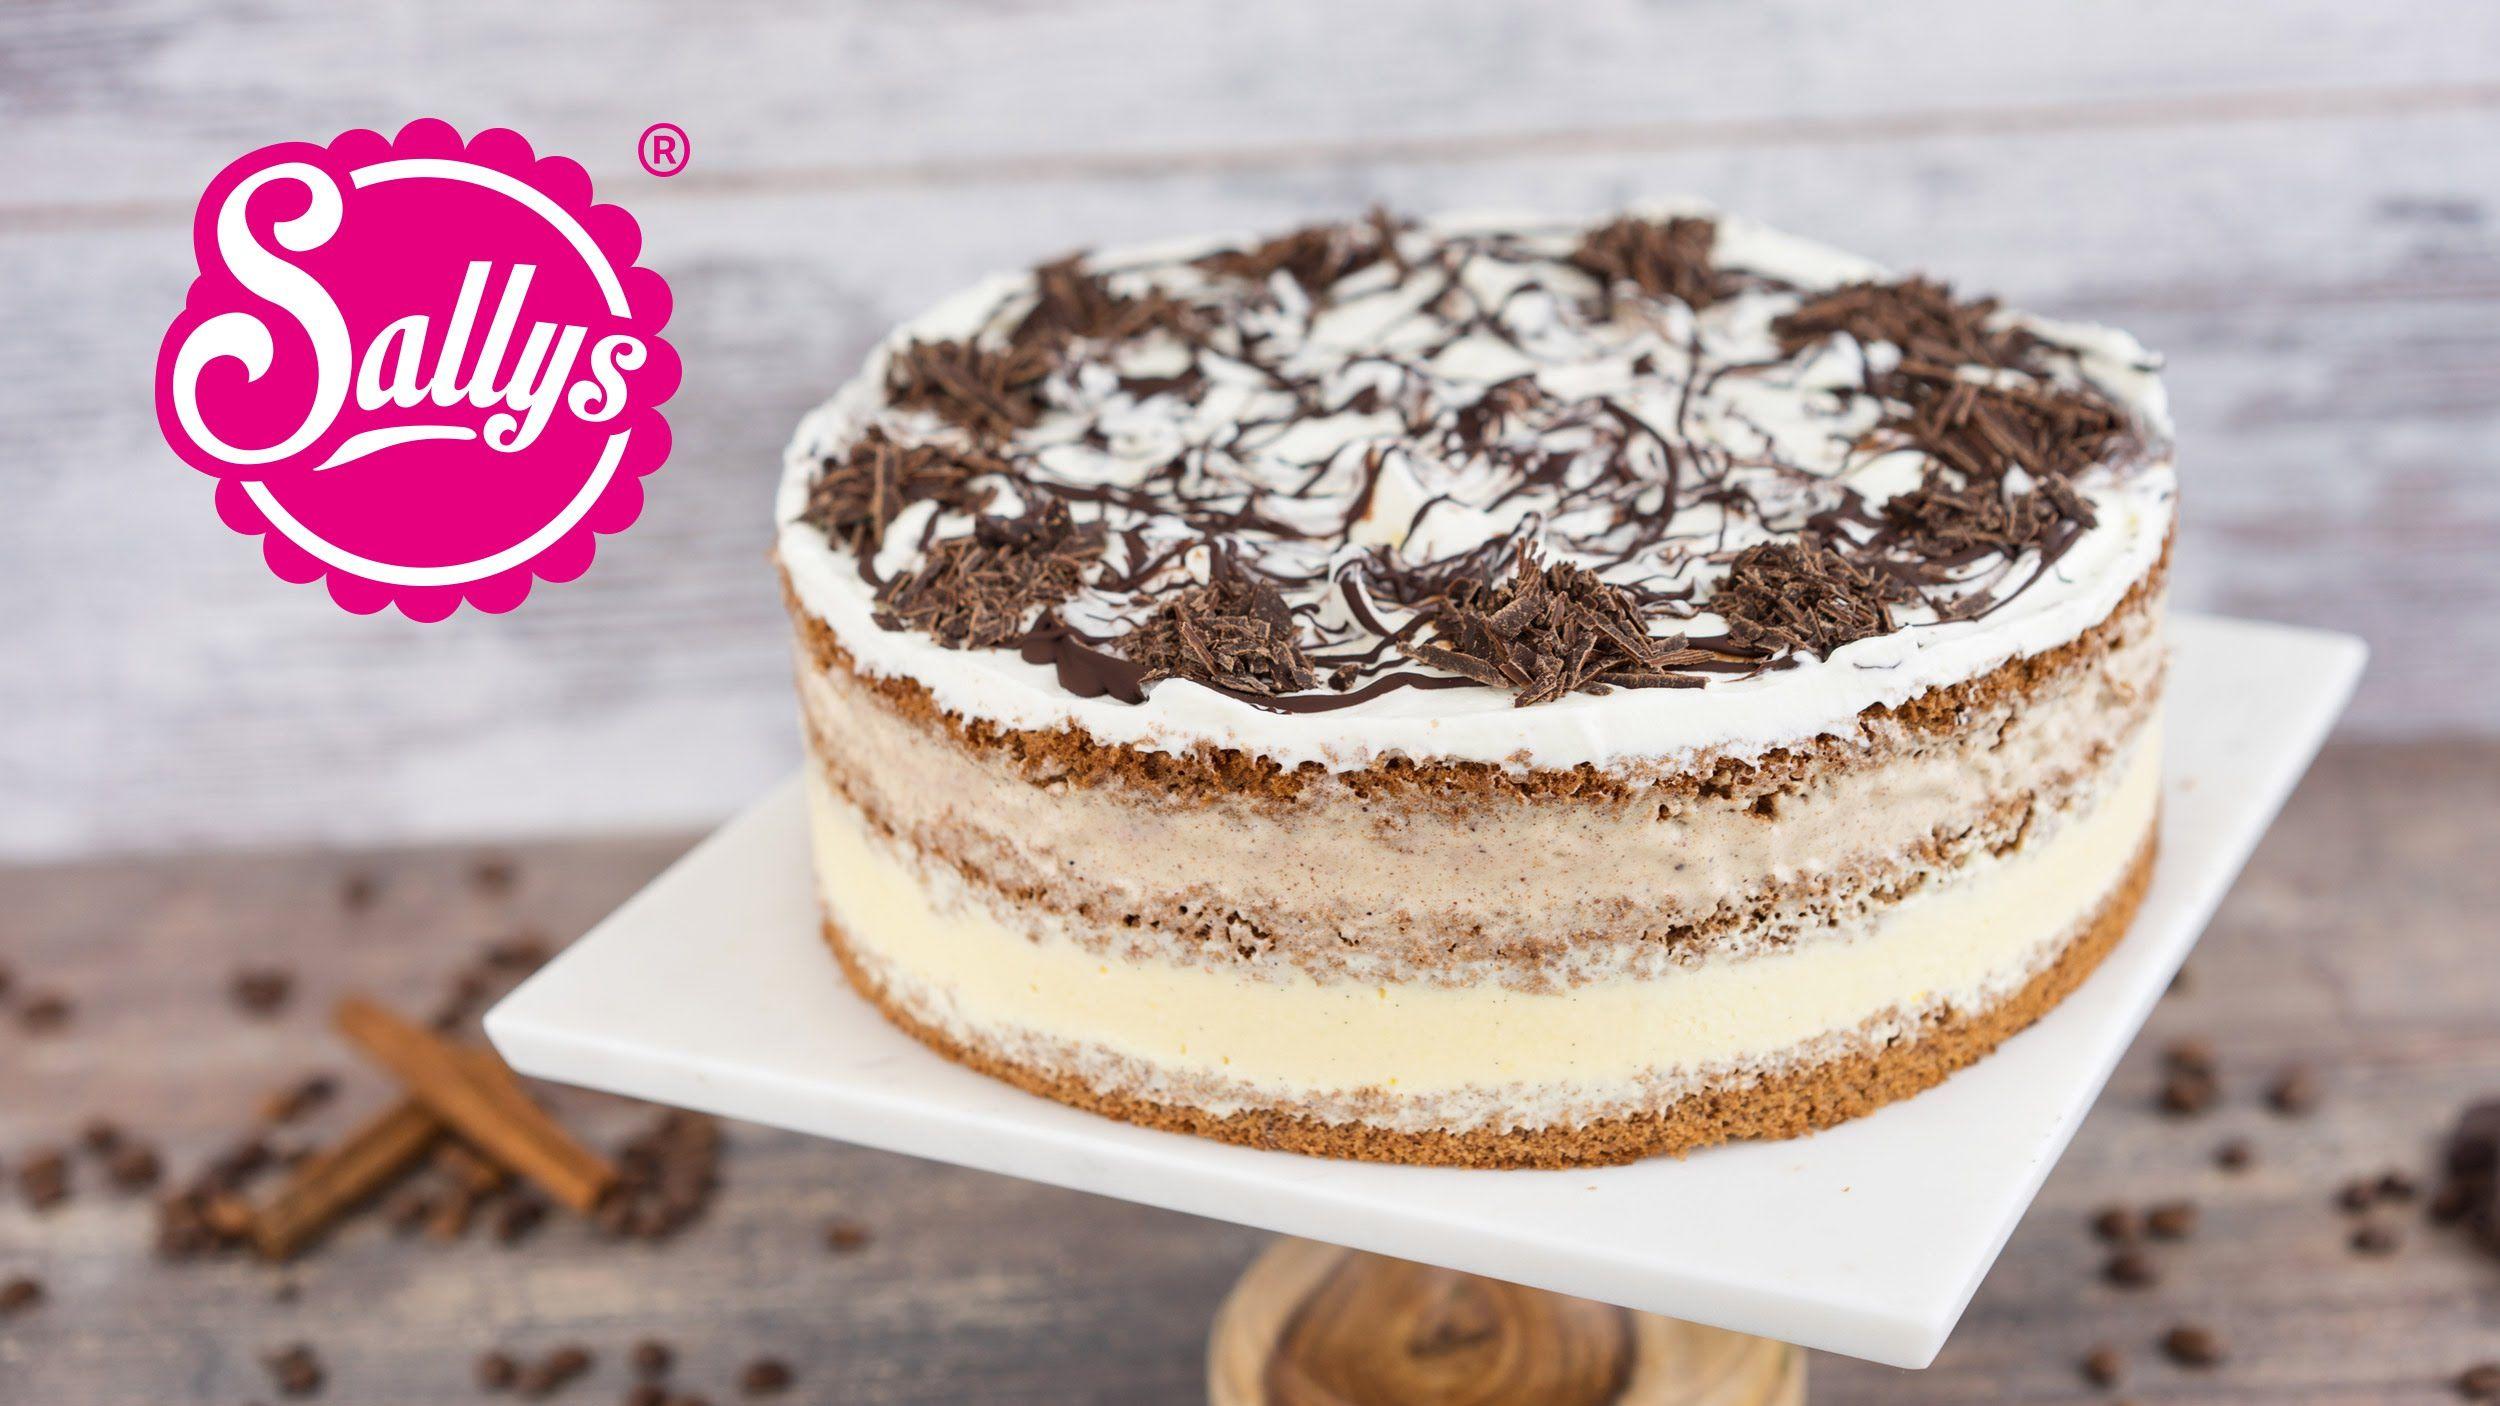 Eistorte mit Vanille und Zimtparfait Naked Cake